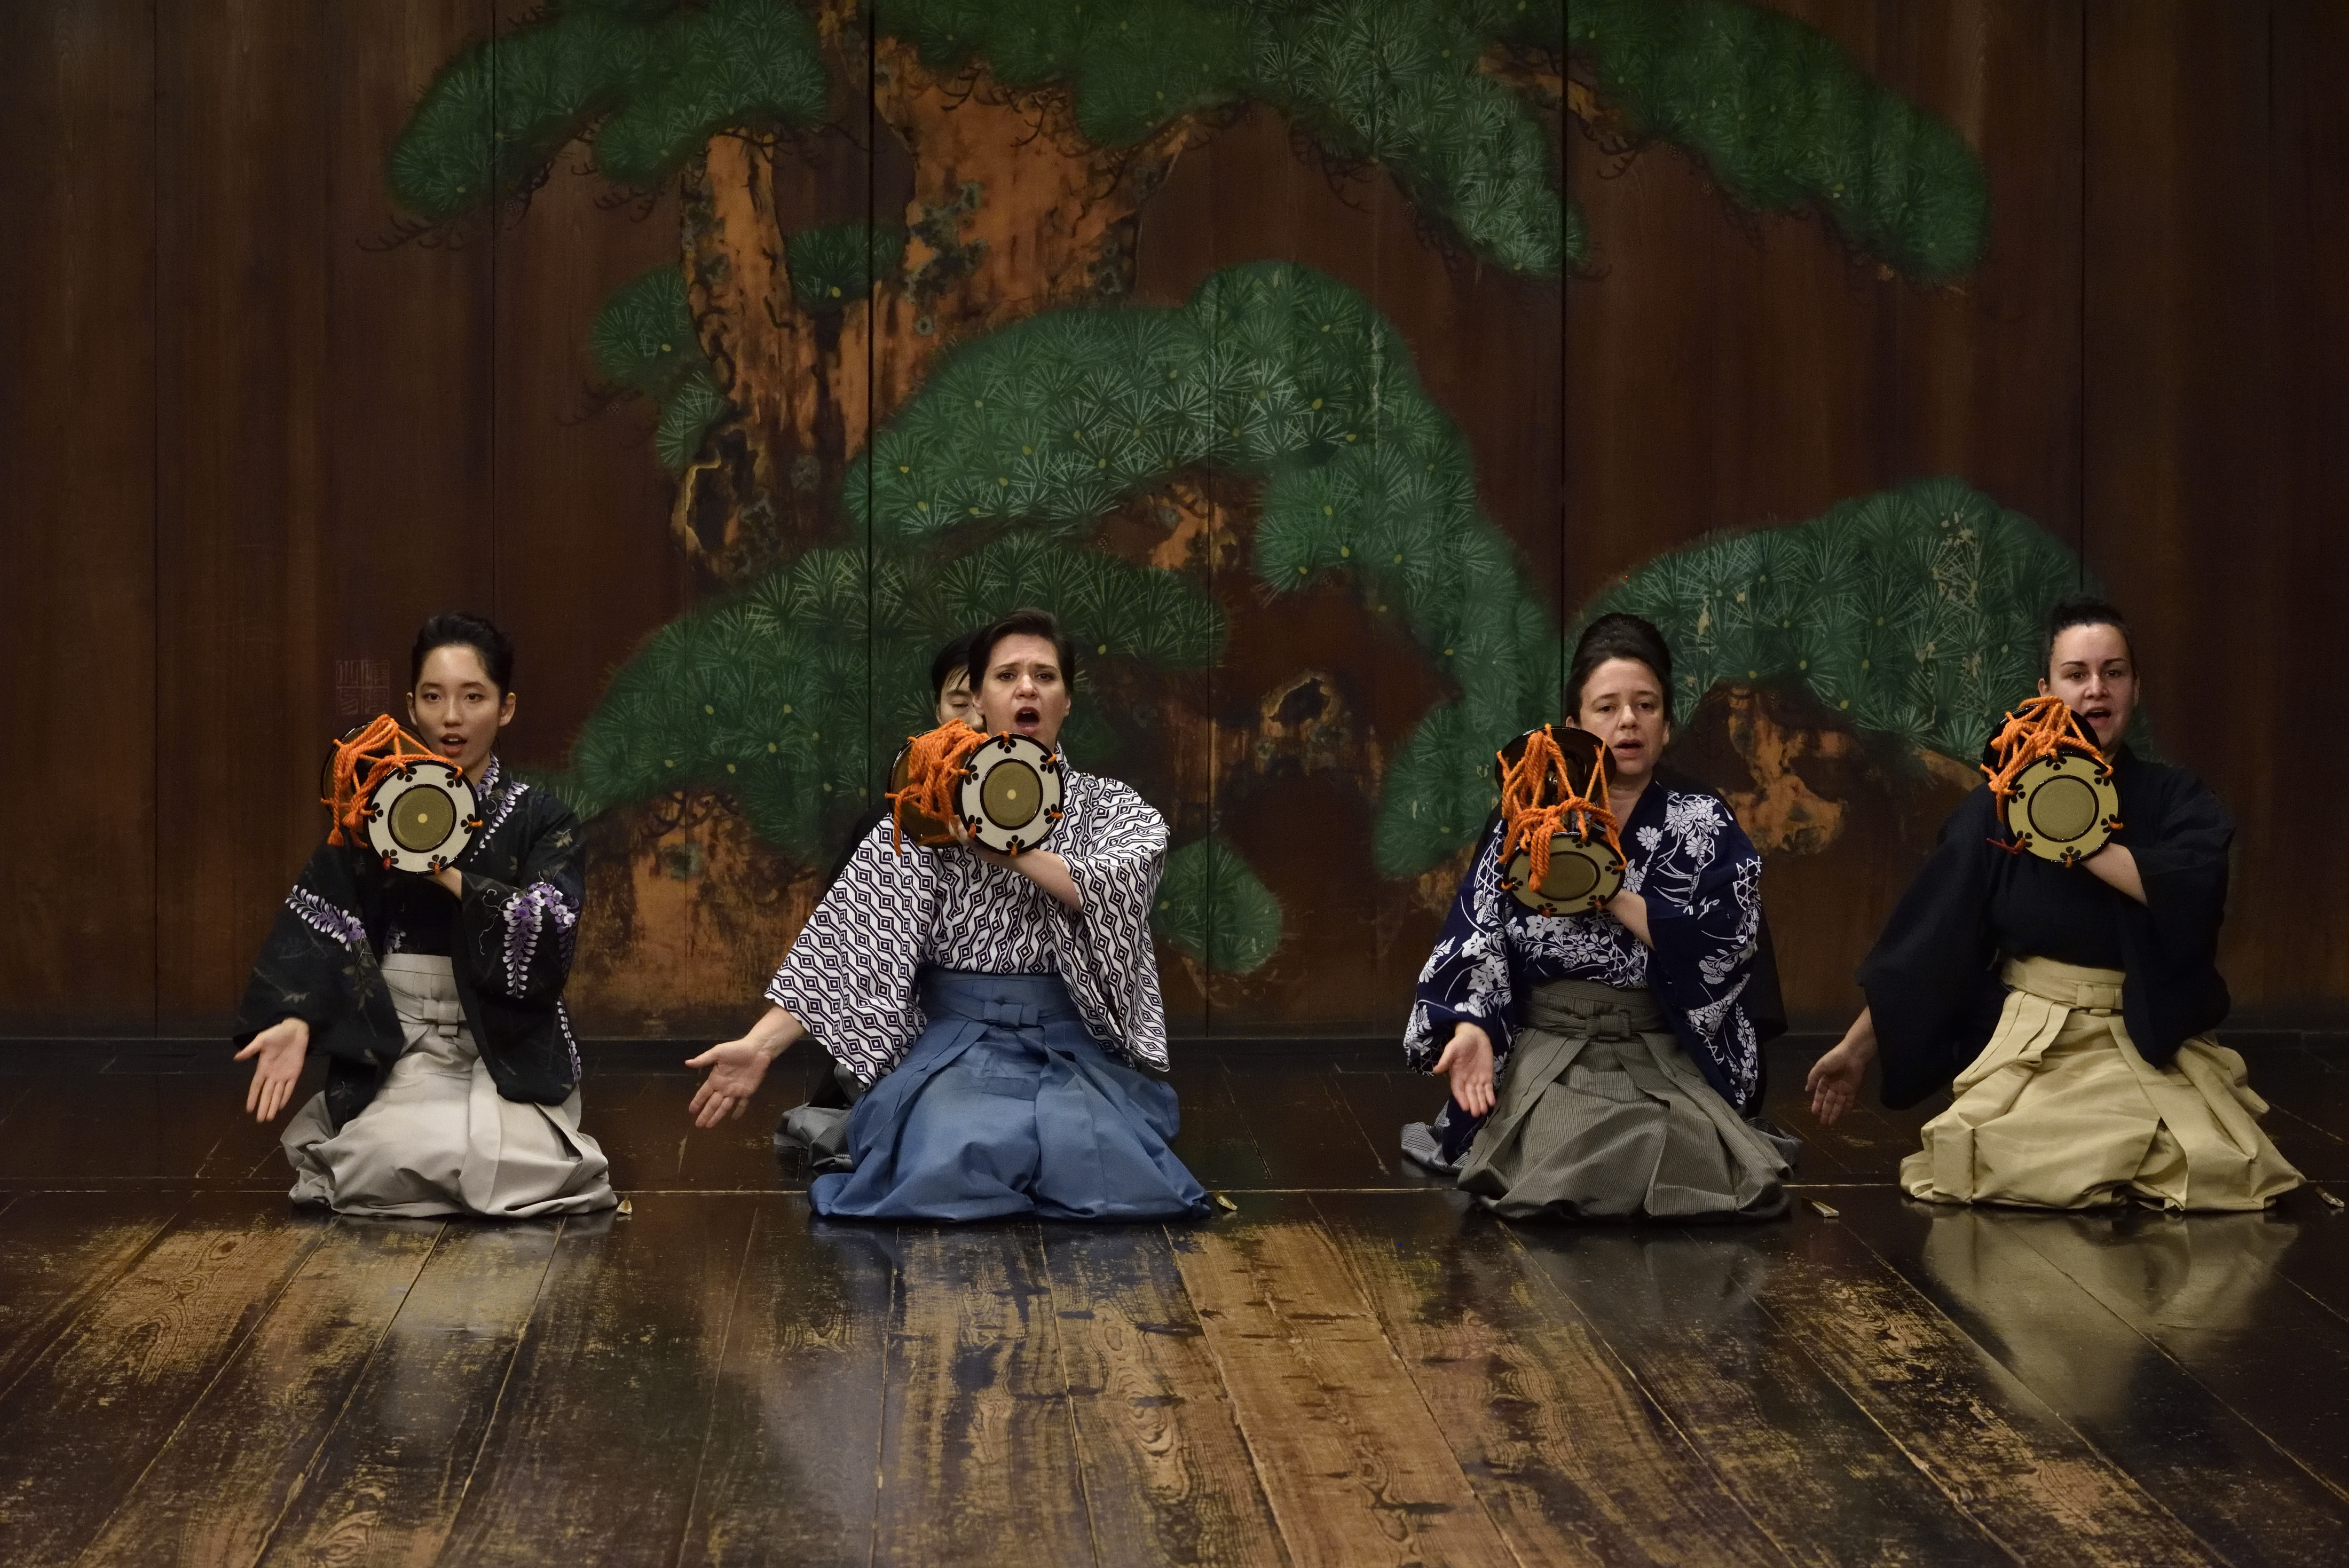 Photos by Takuya Oshima